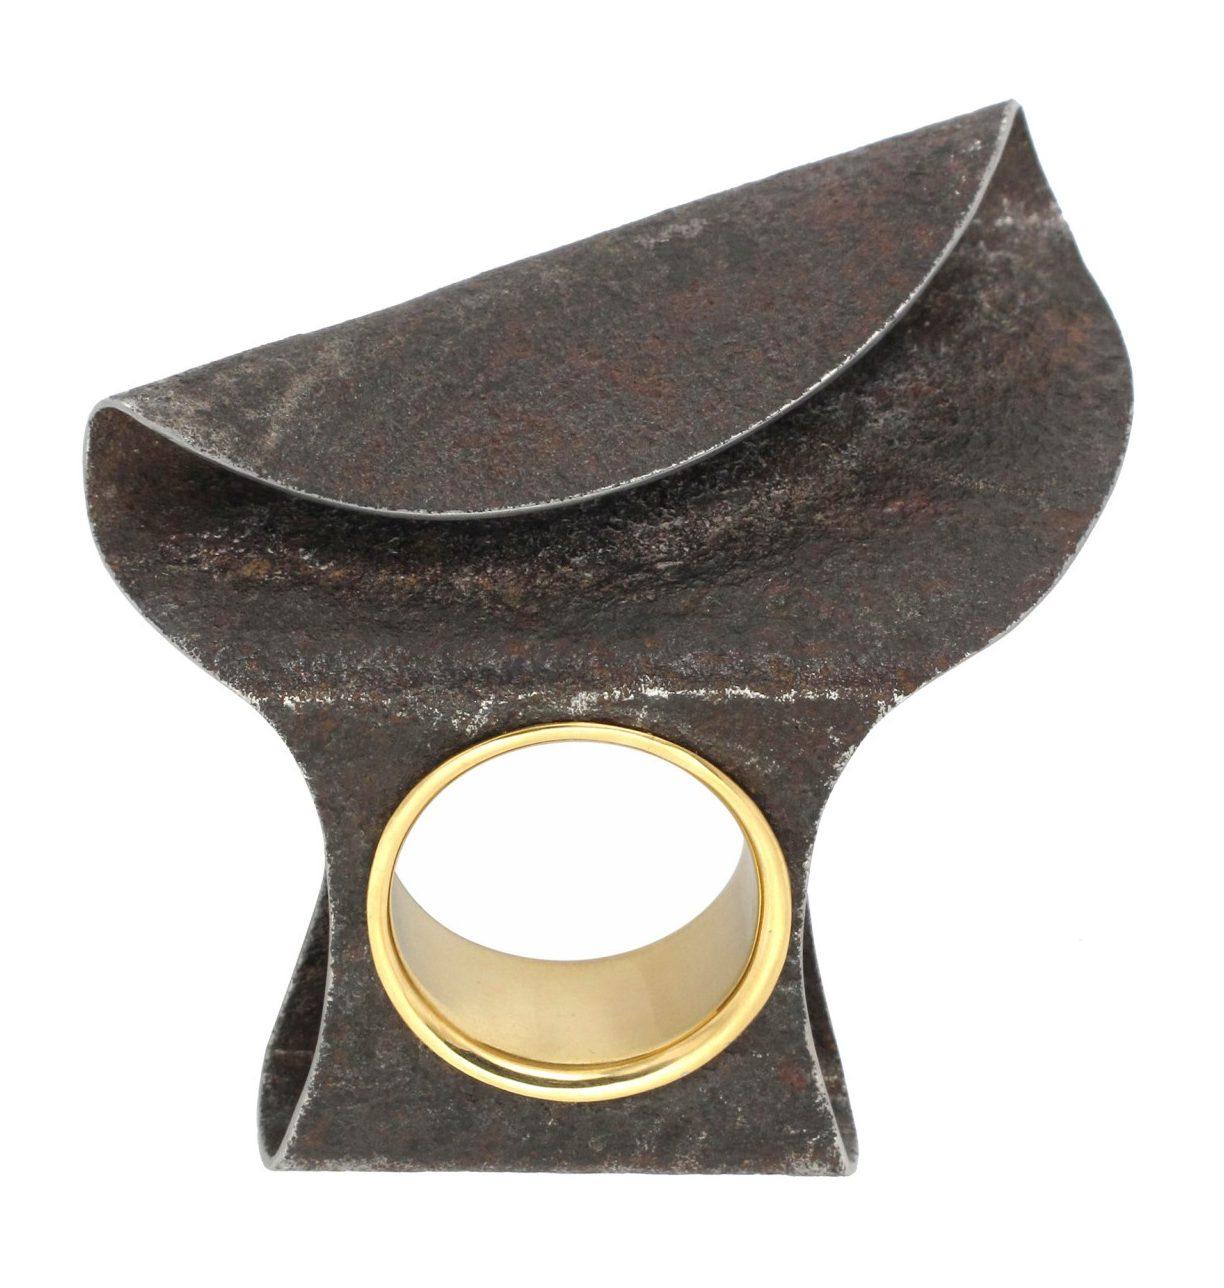 Marianne Anselin, Plier, ring, metaal